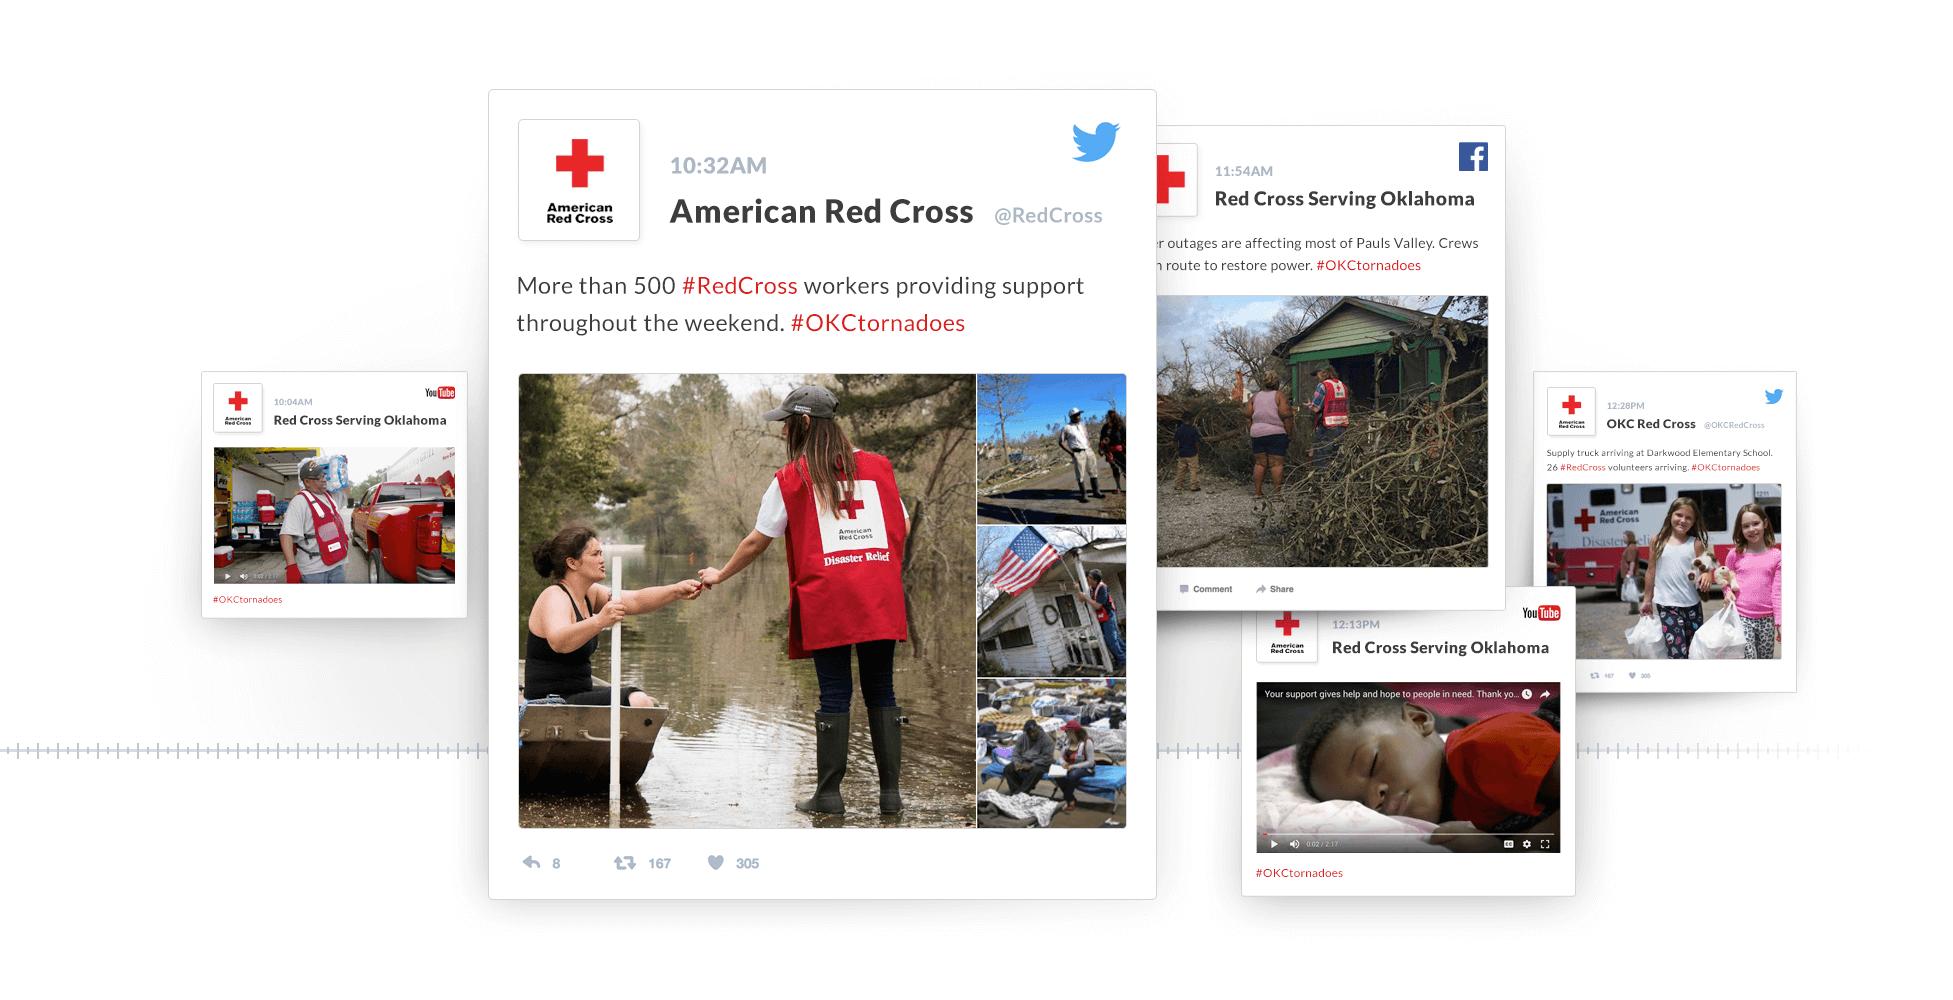 Red Cross Social Media Disaster Action Center web design mockup